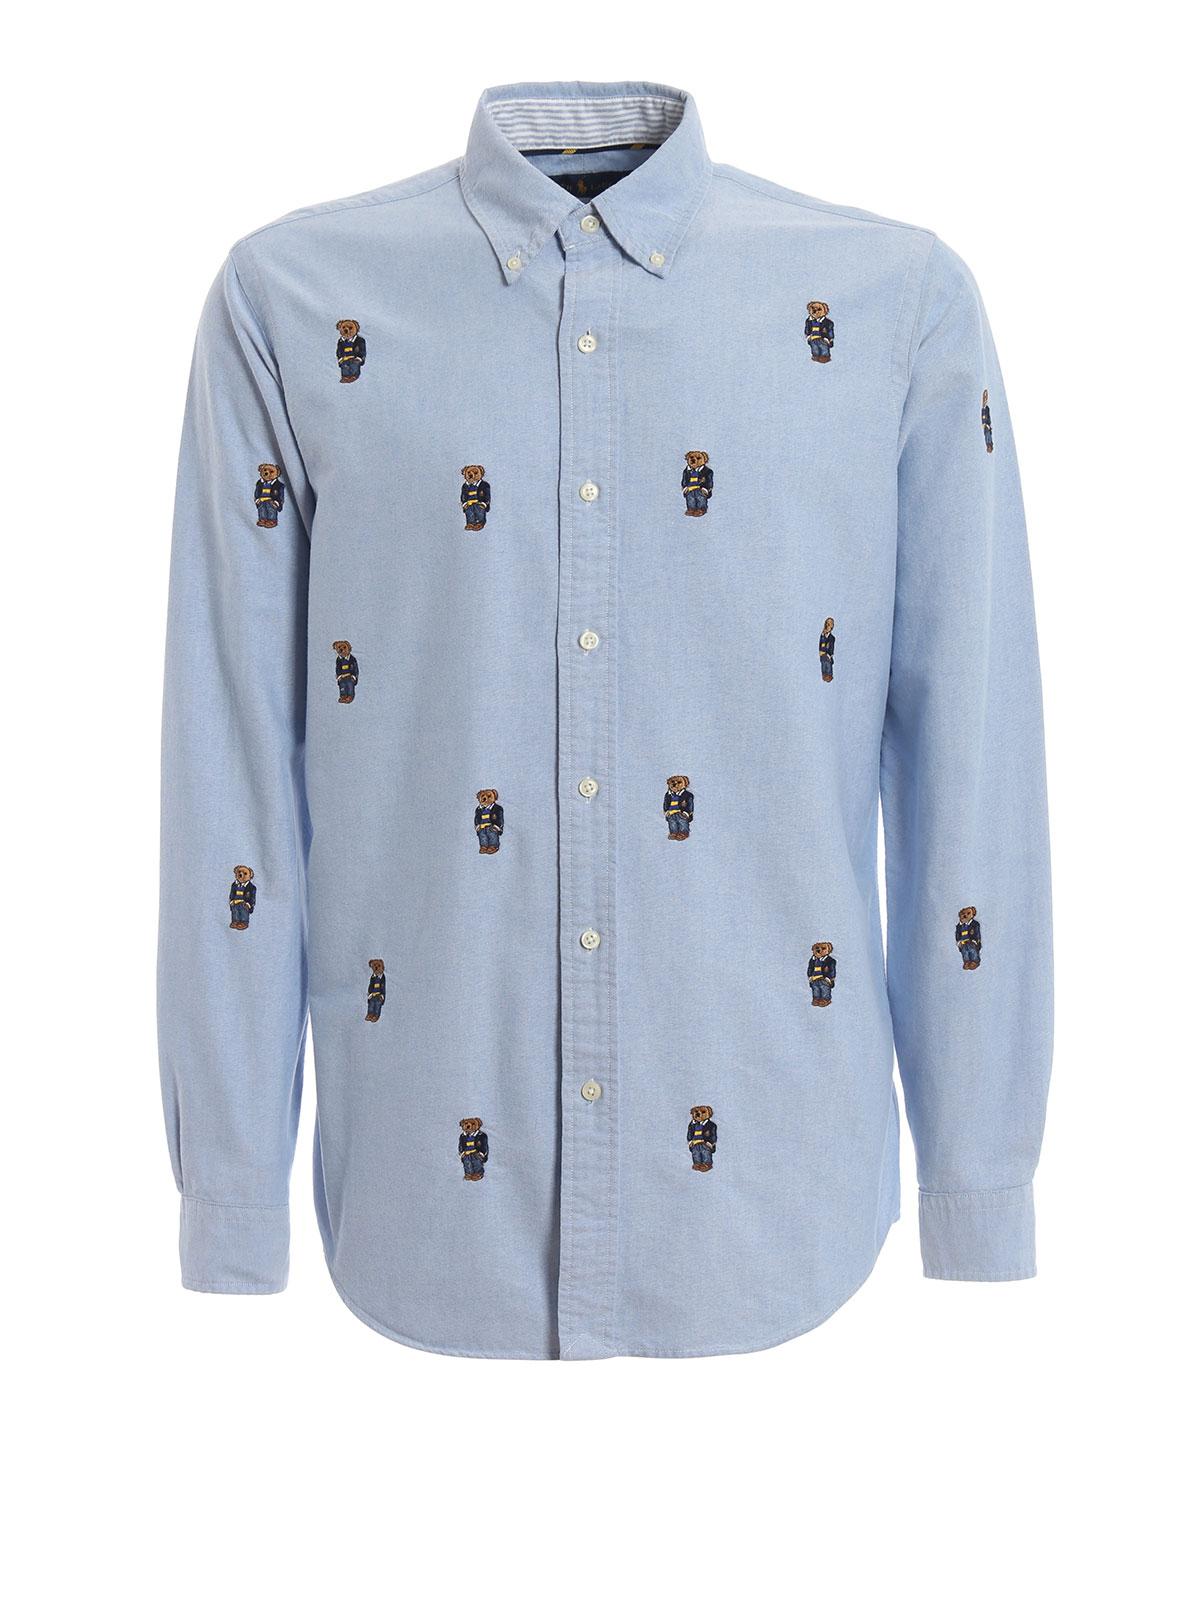 4dfa73ce POLO RALPH LAUREN: shirts - Yale Preppy Bear b/d Oxford cotton shirt